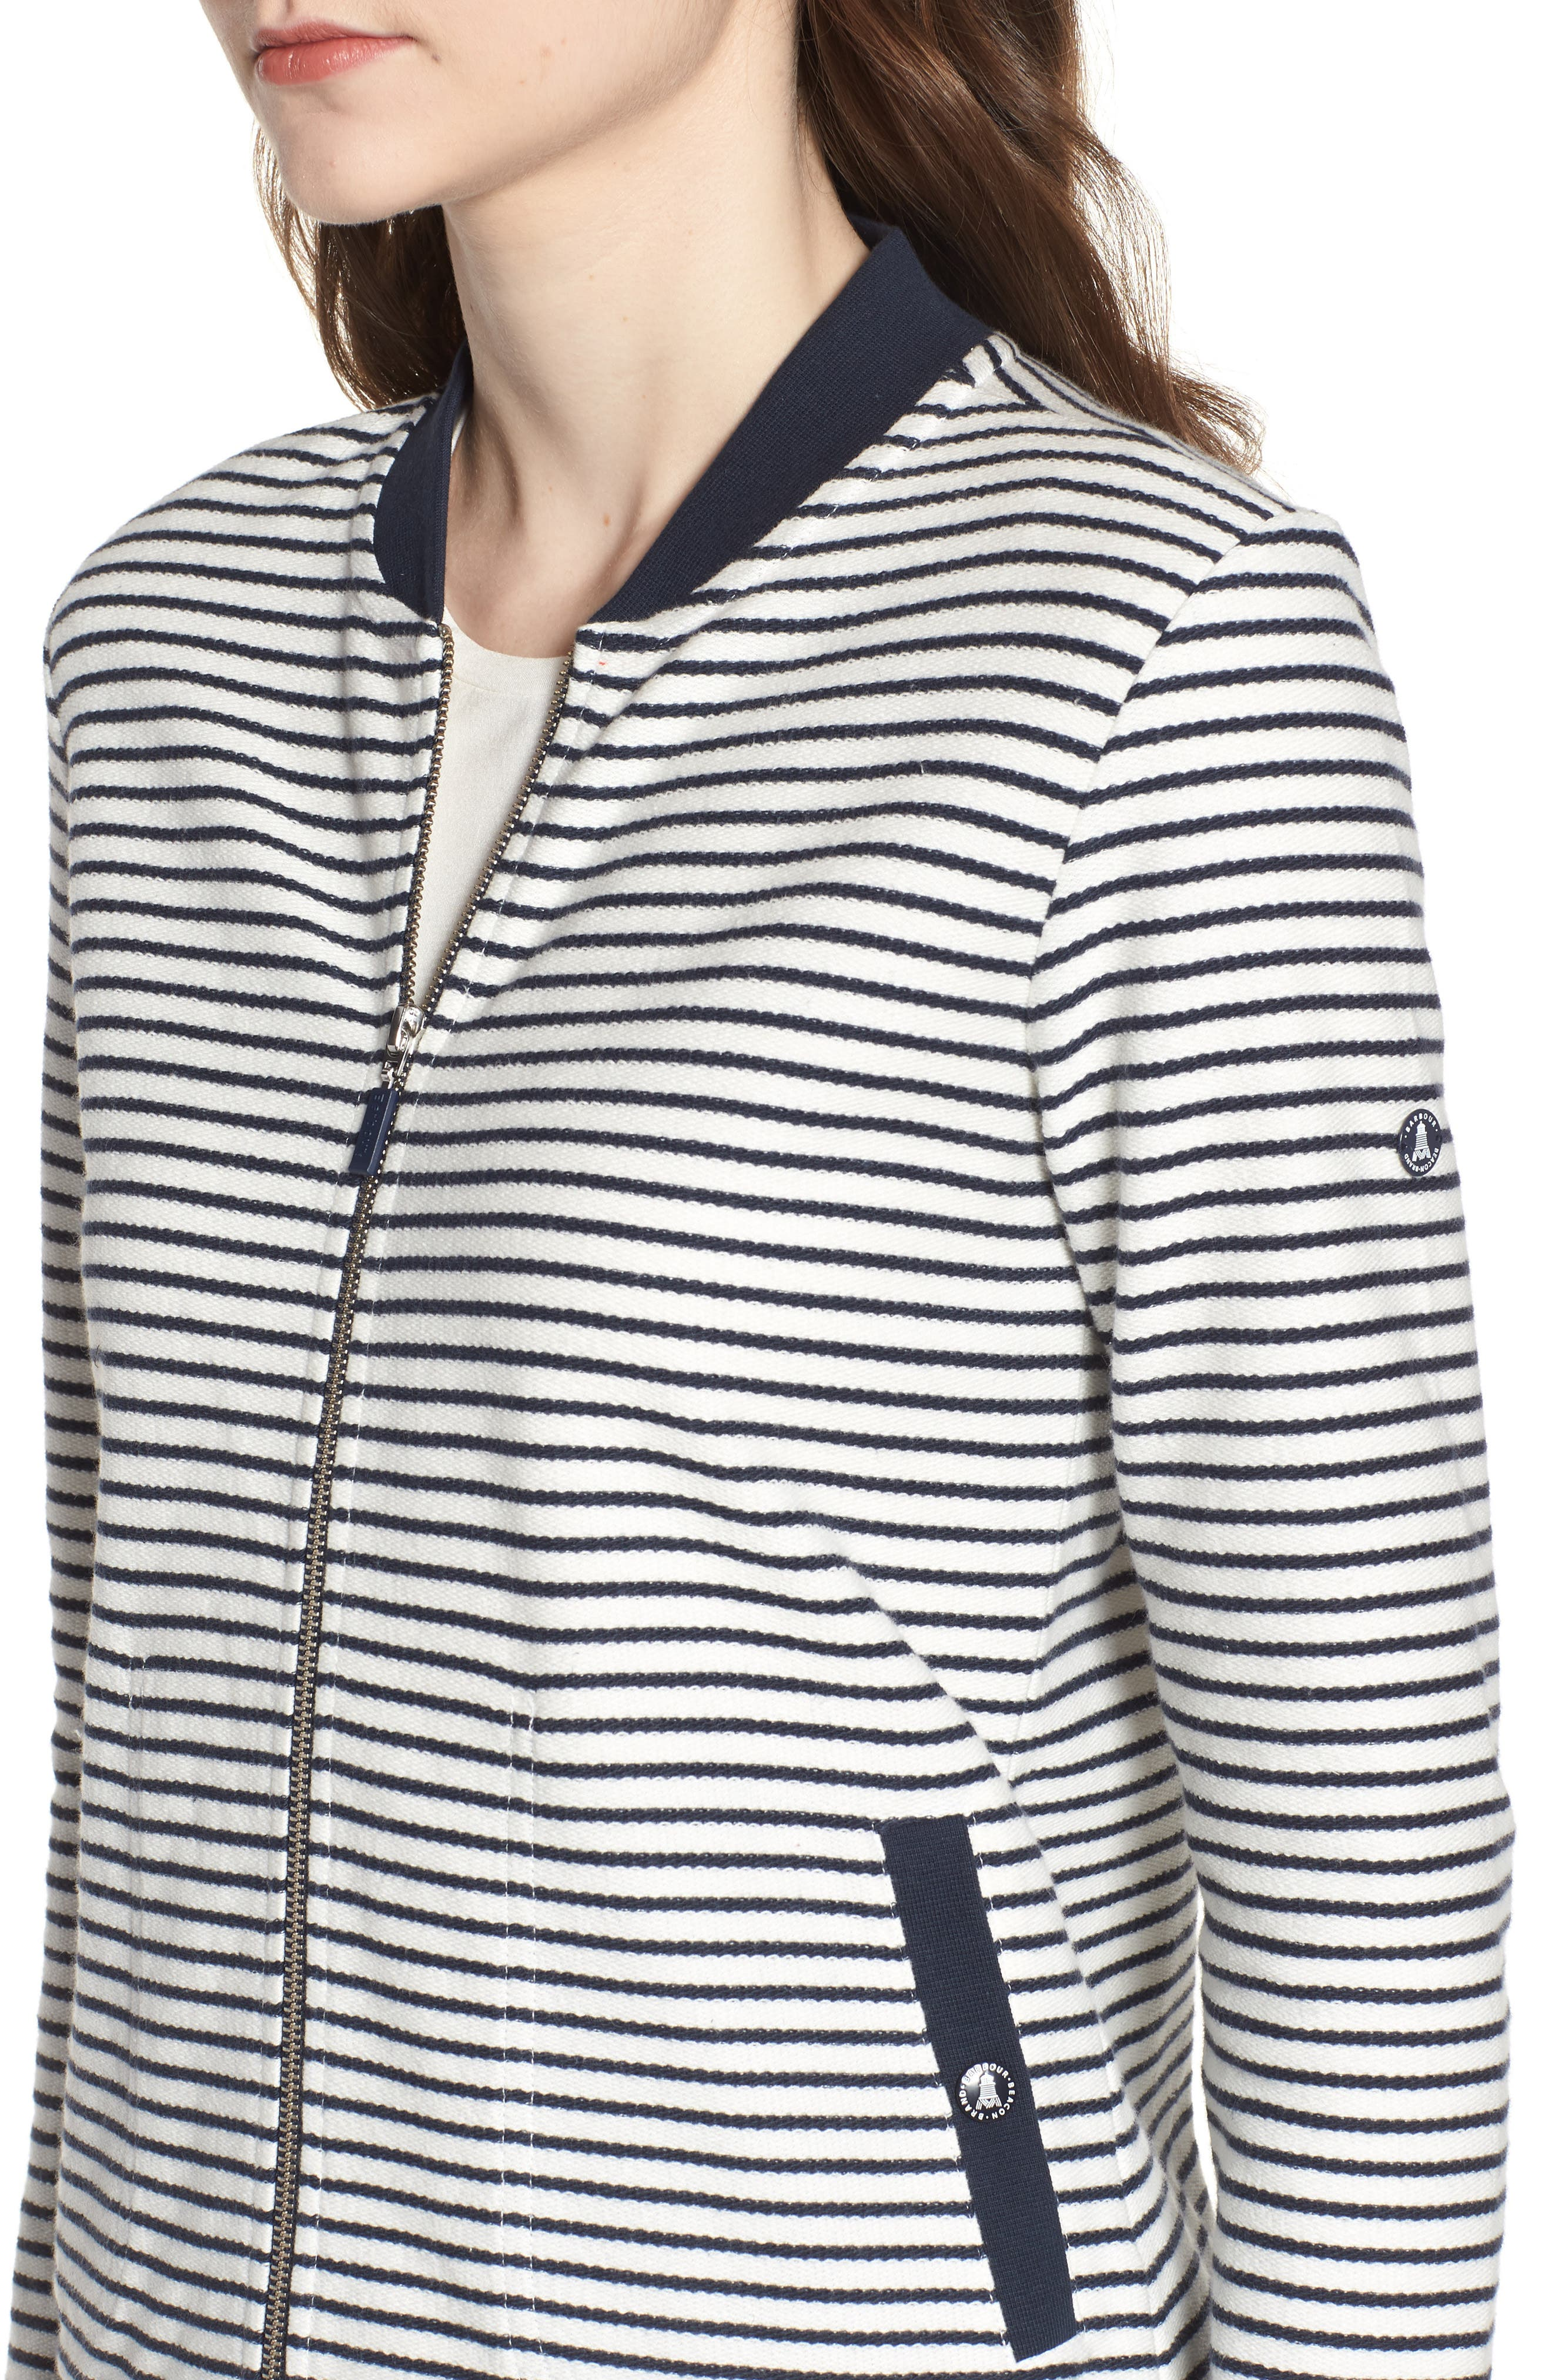 Bamburgh Sweater Jacket,                             Alternate thumbnail 4, color,                             White/ Navy